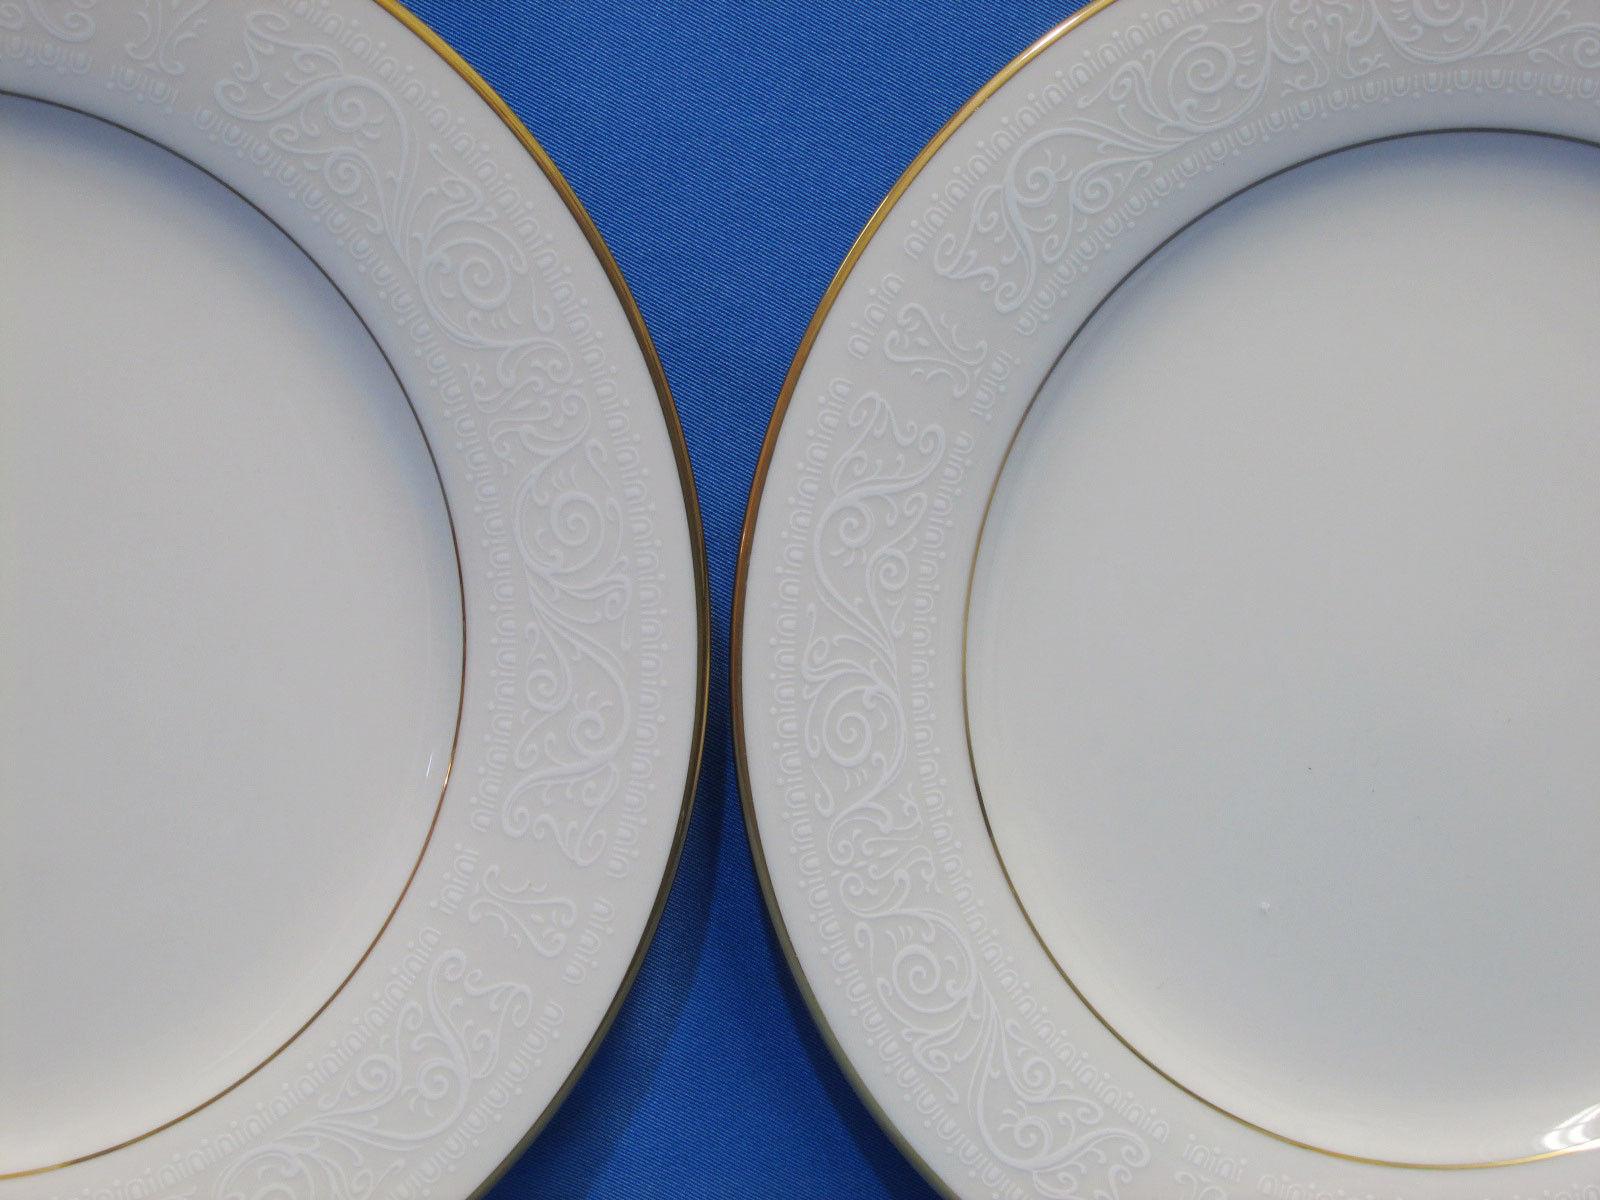 2 Noritake China Tulane 7562 Salad / Dessert Plates Ivory White Scroll Gold Trim